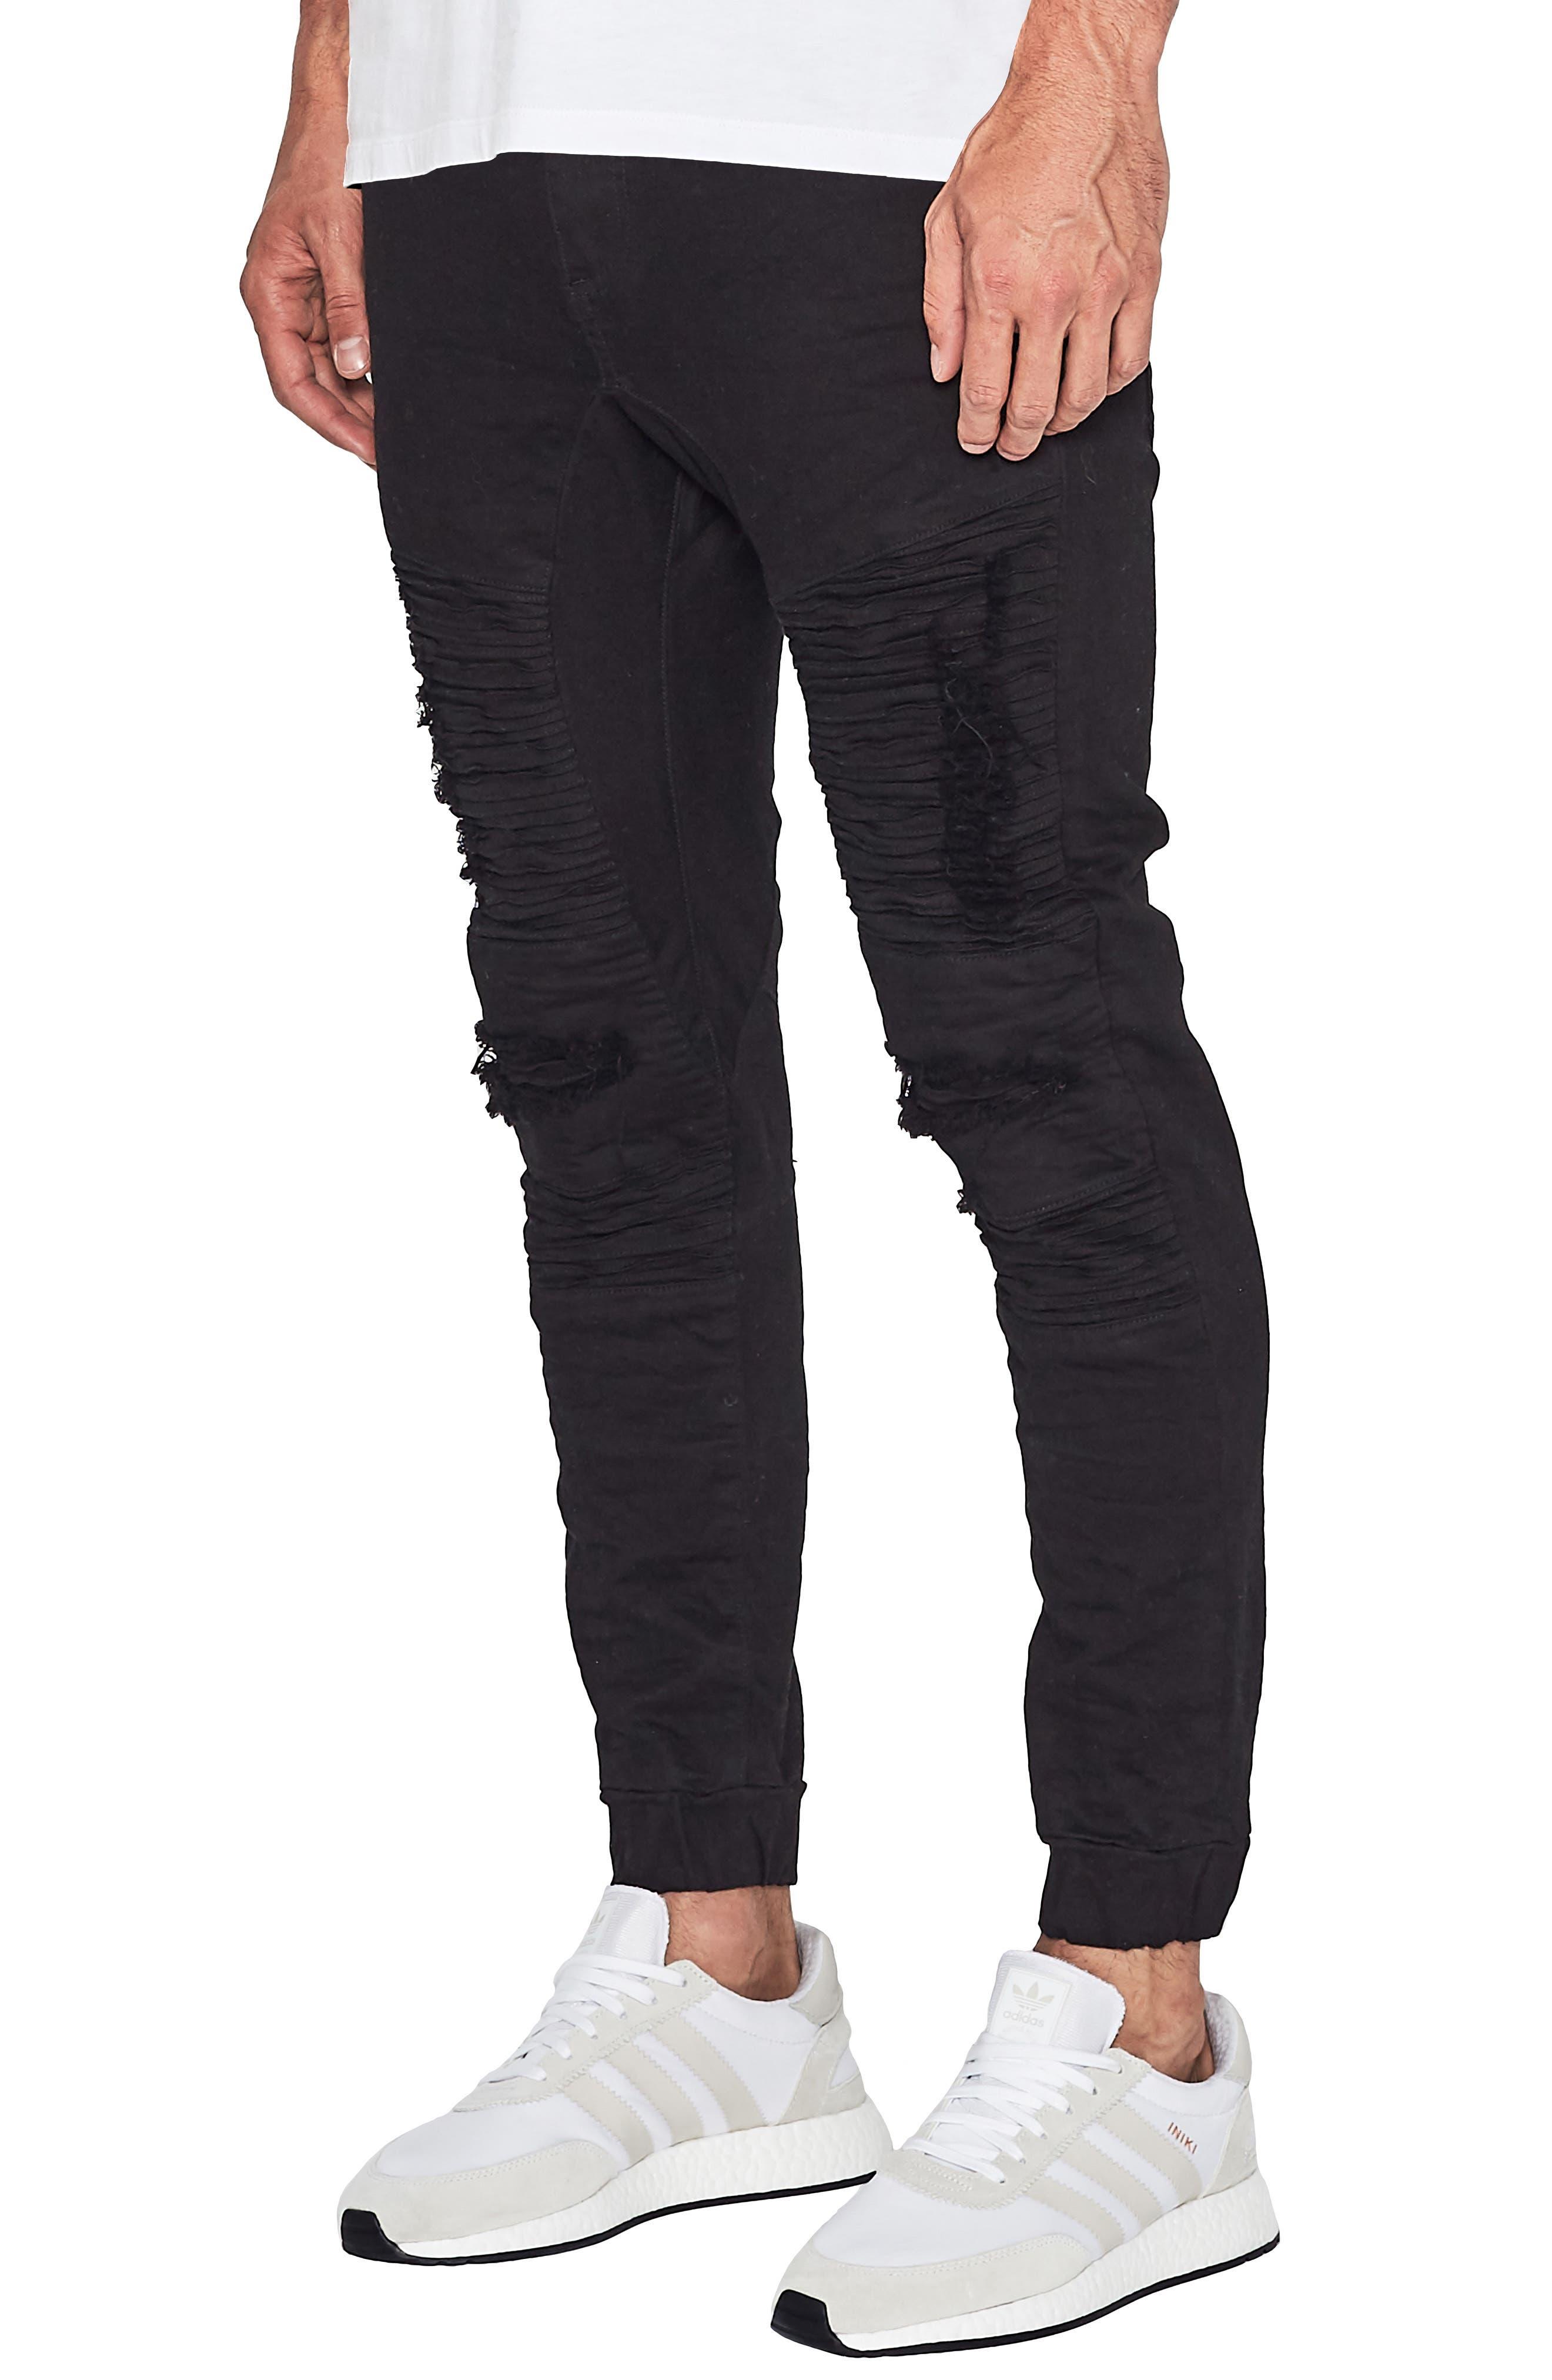 Hellcat Slim Fit Pants,                             Alternate thumbnail 3, color,                             001